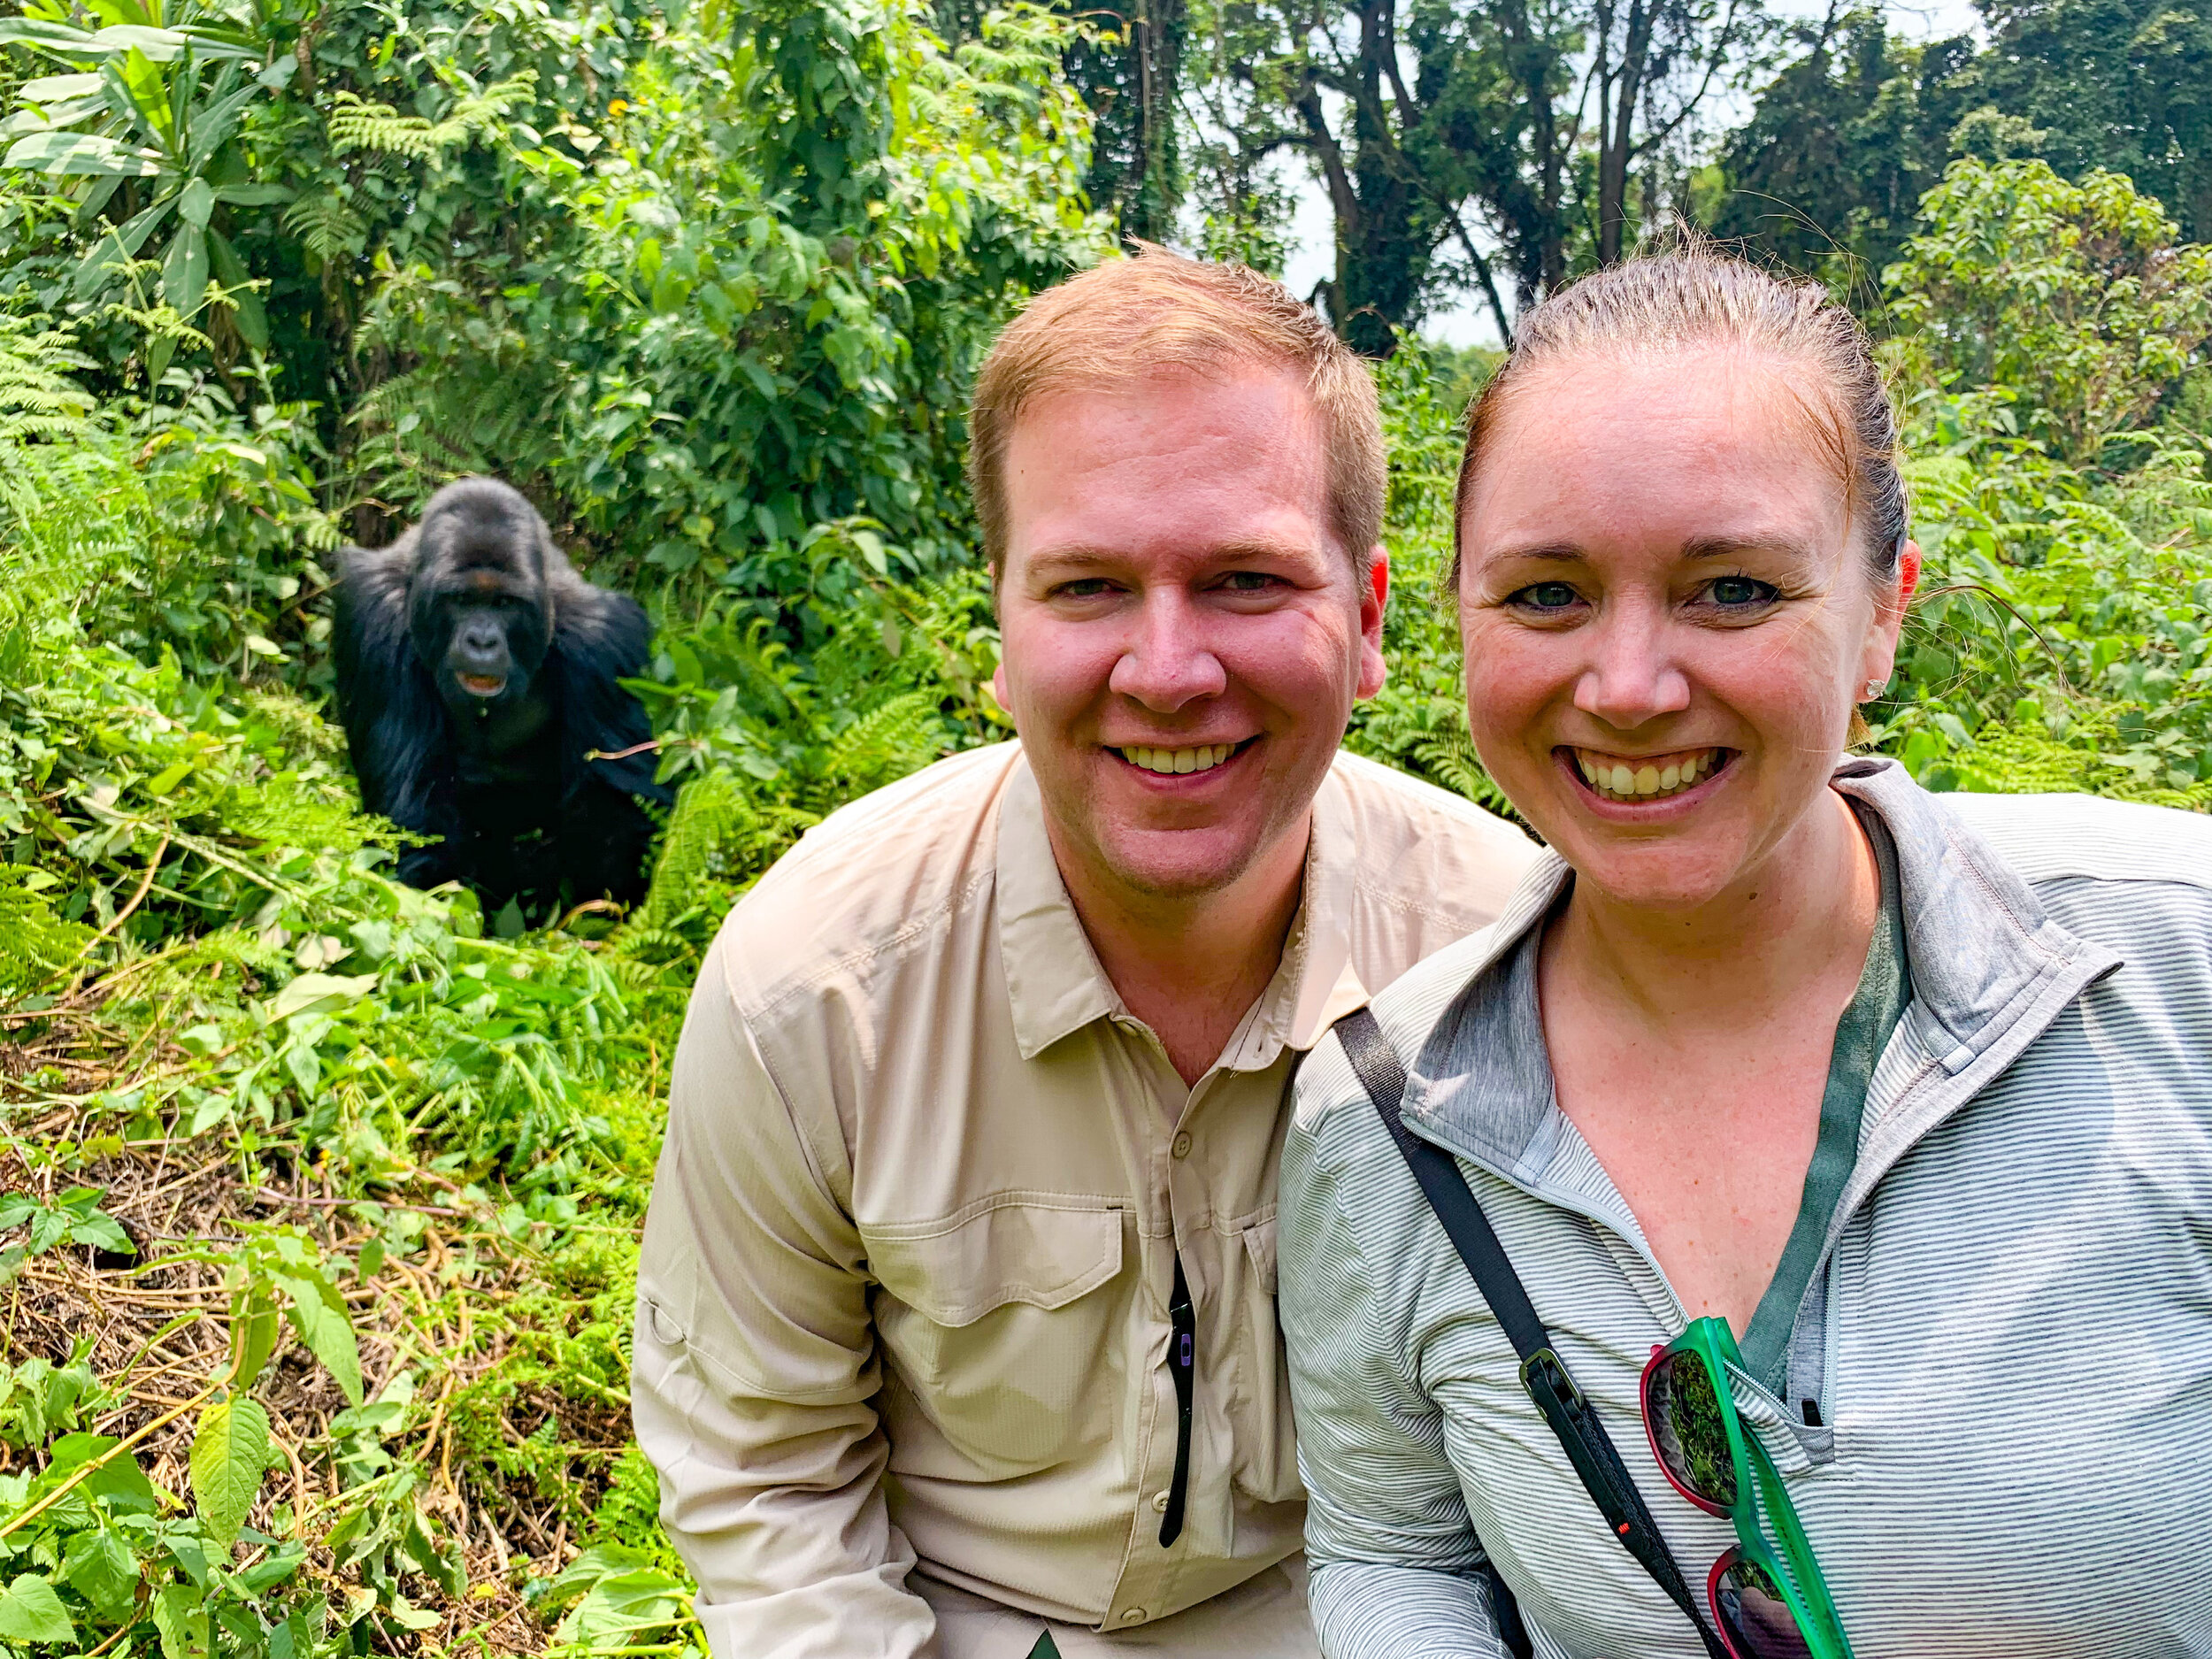 Picture with Titus the silverback gorilla